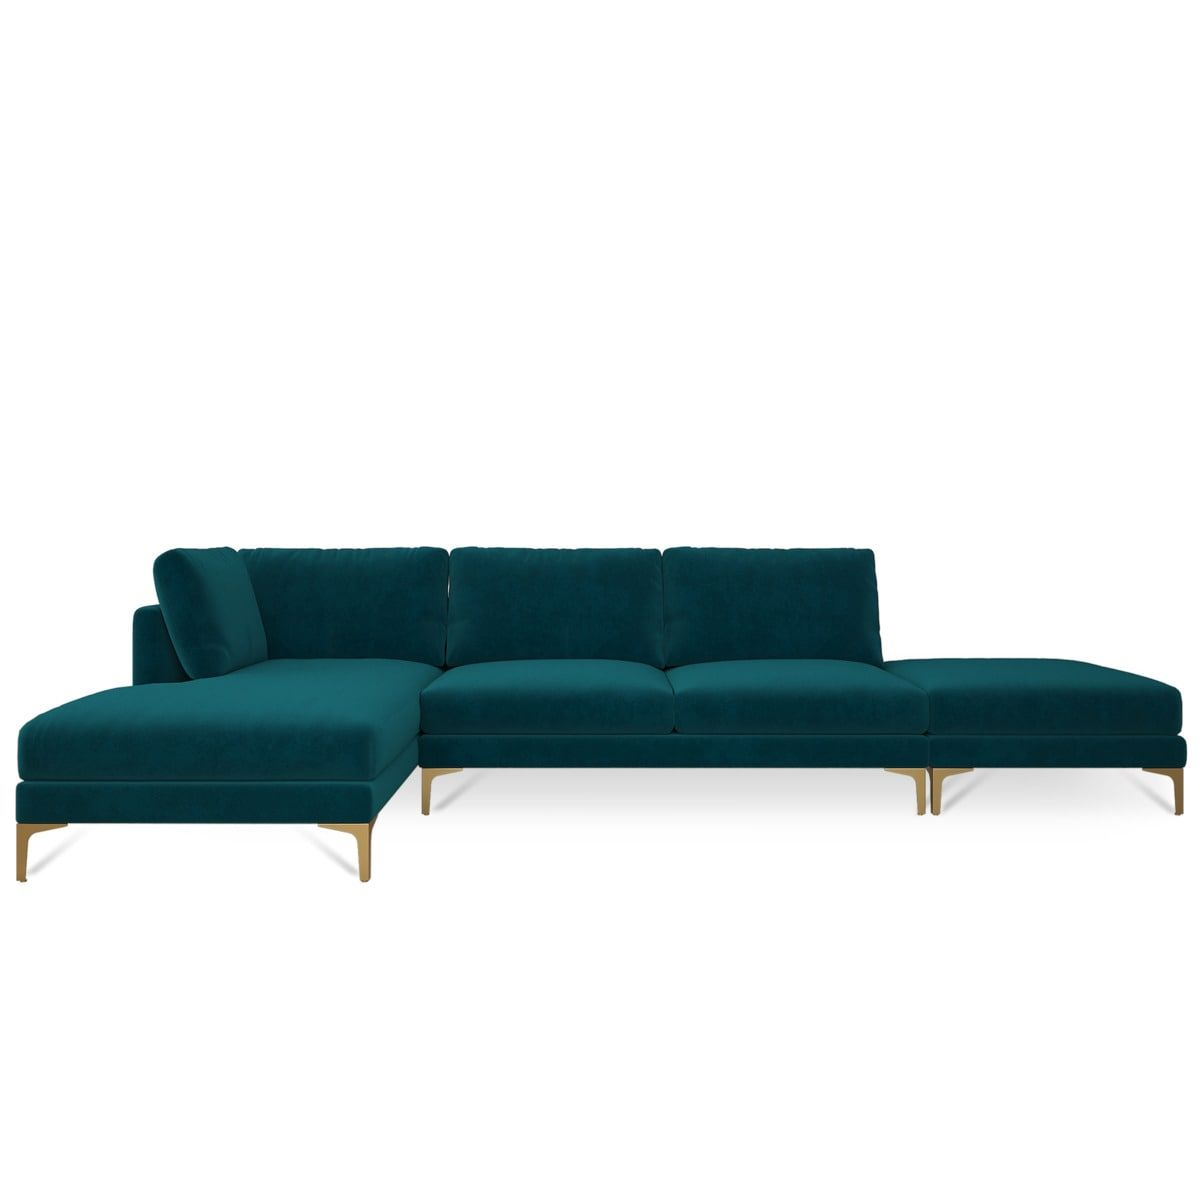 Adams Chaise Sectional Sofa With Ottoman Modern Teal Velvet 130 Modular Chaise Lounge Brass Metal Leg Left Facing Castlery Modern Furniture Sectional Sofa Classic Living Room Sofa